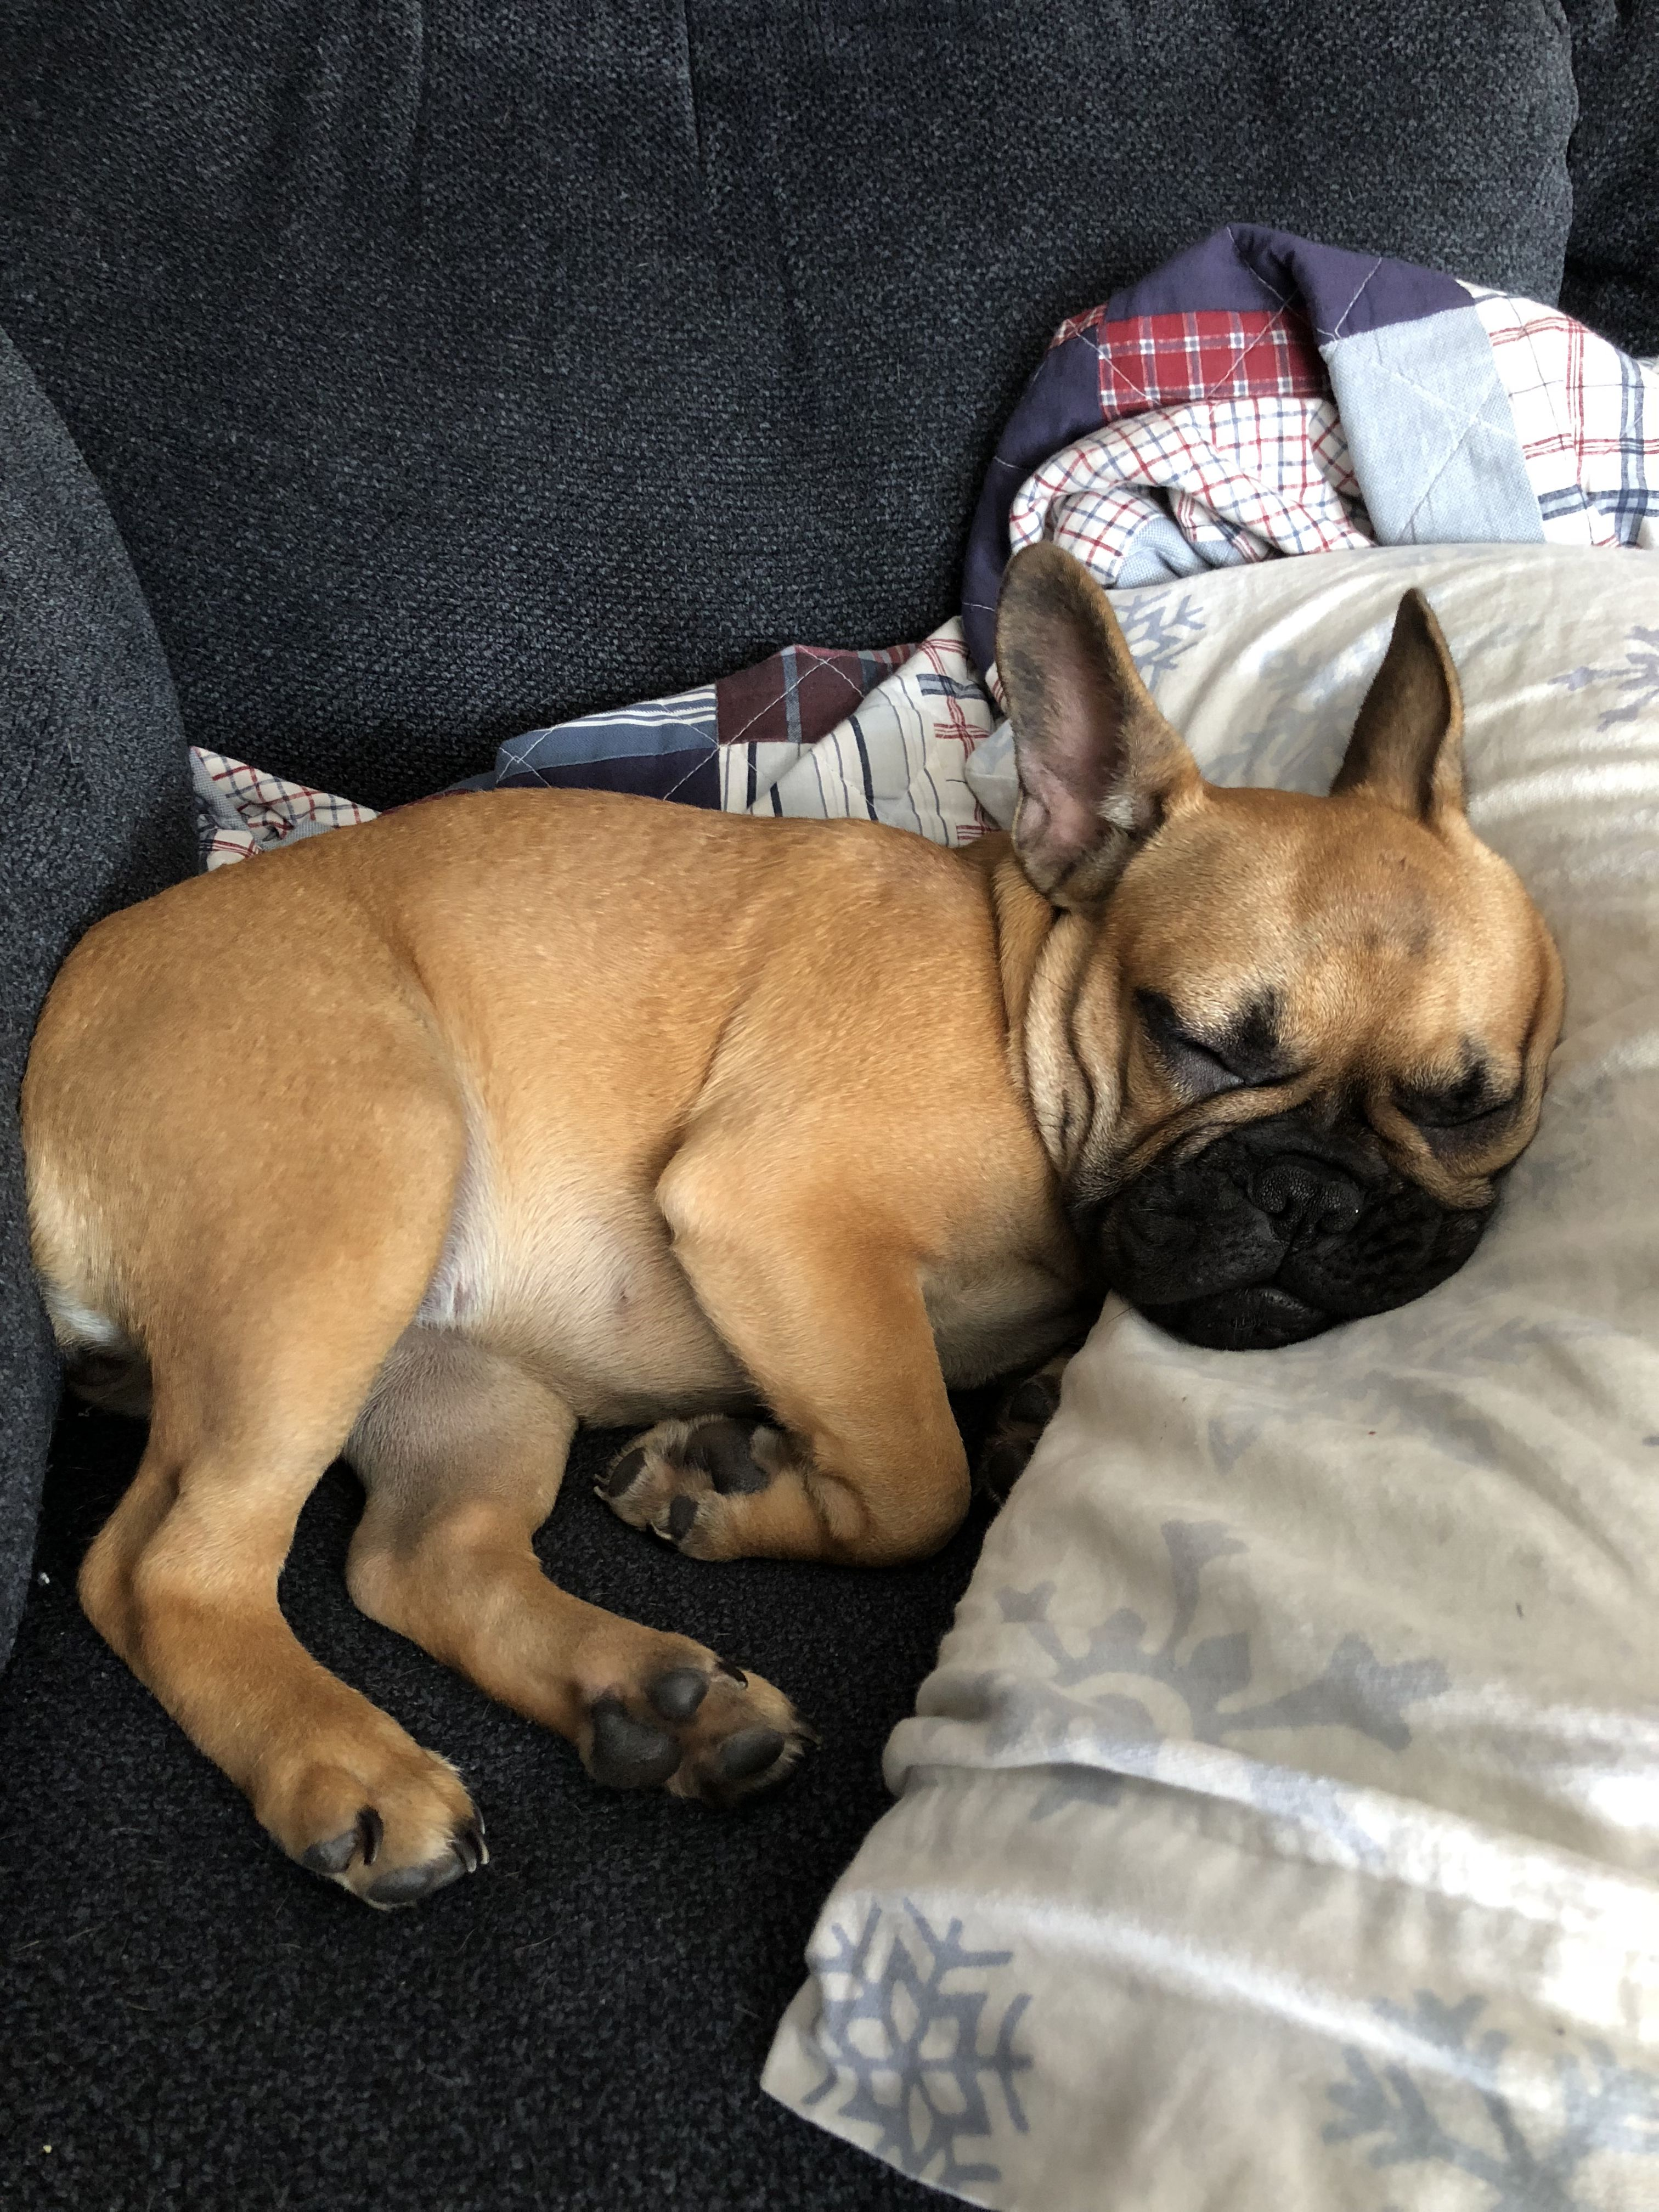 Pin von Elisha Goulet auf Ruby the French Bulldog